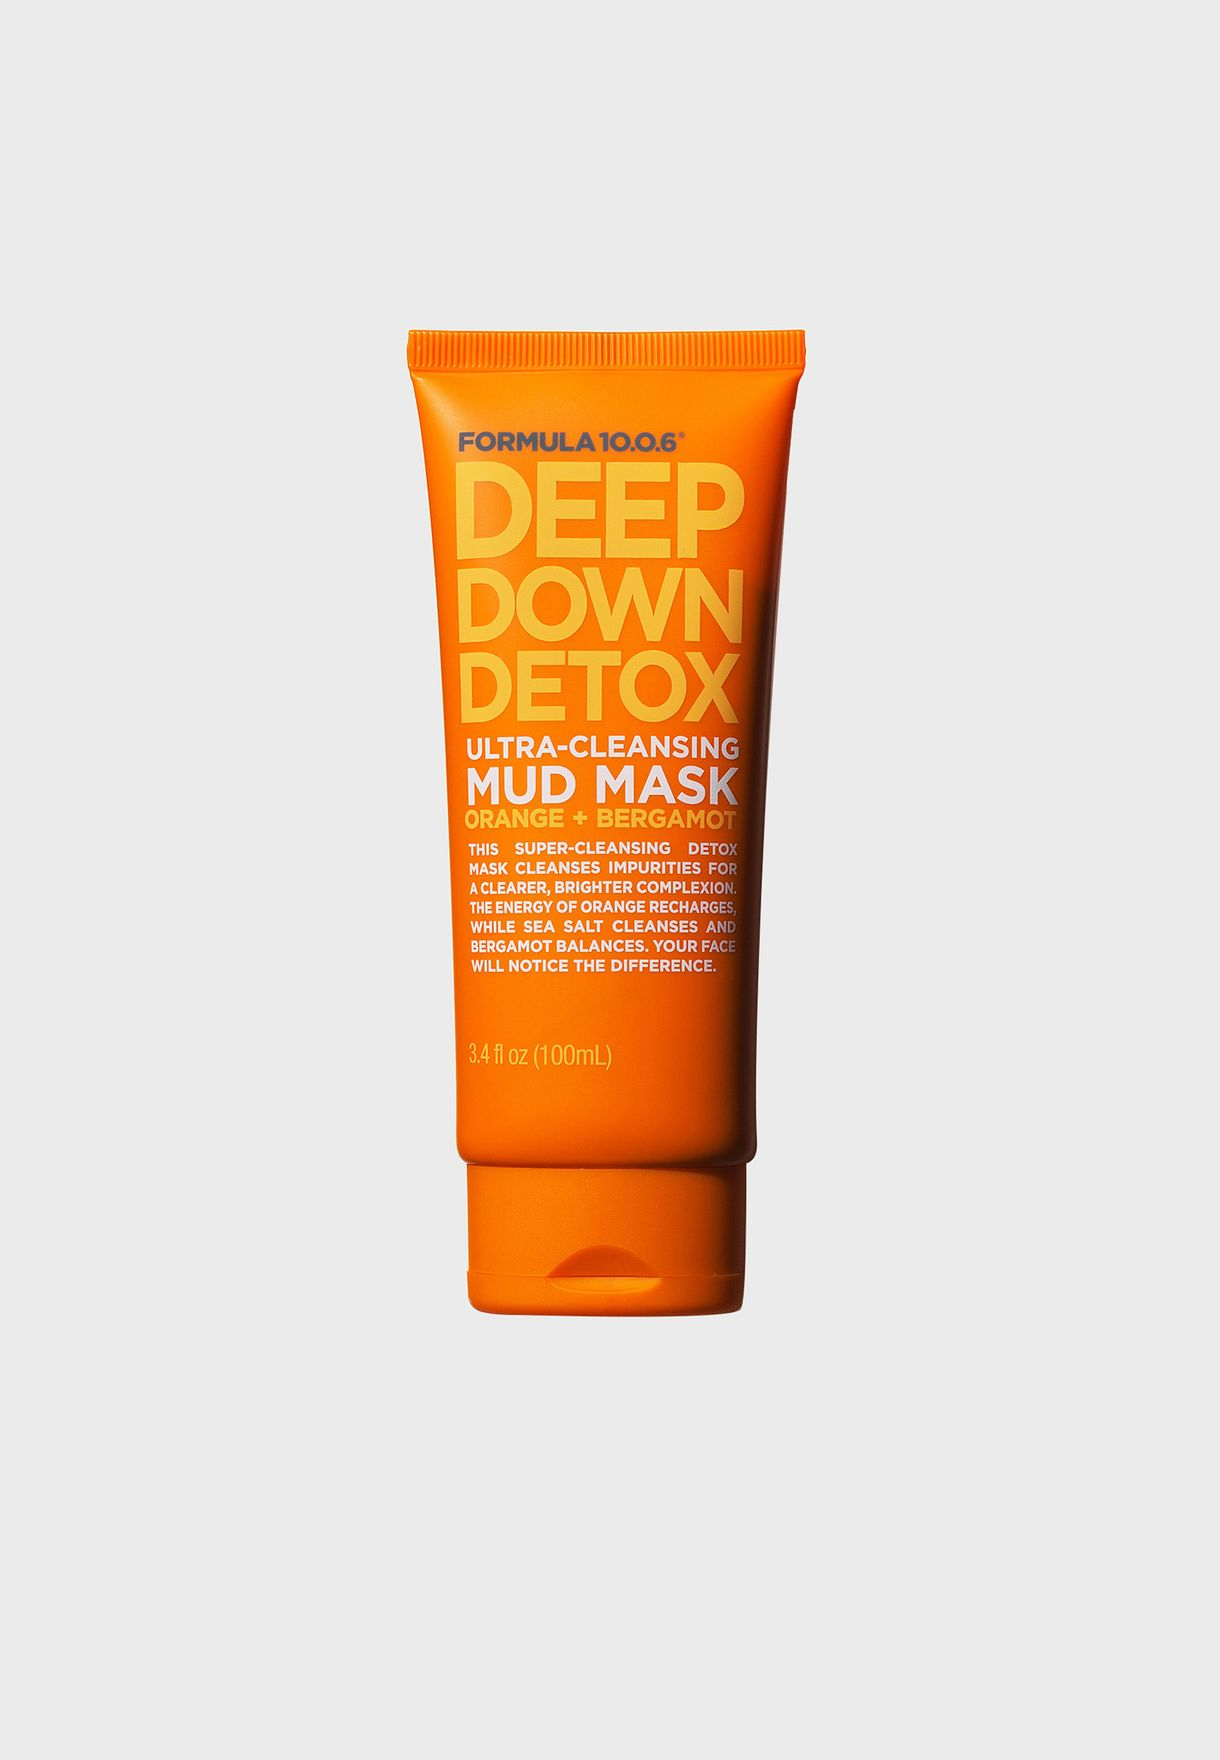 Deep Down Detox - Ultra Cleansing Mud Mask